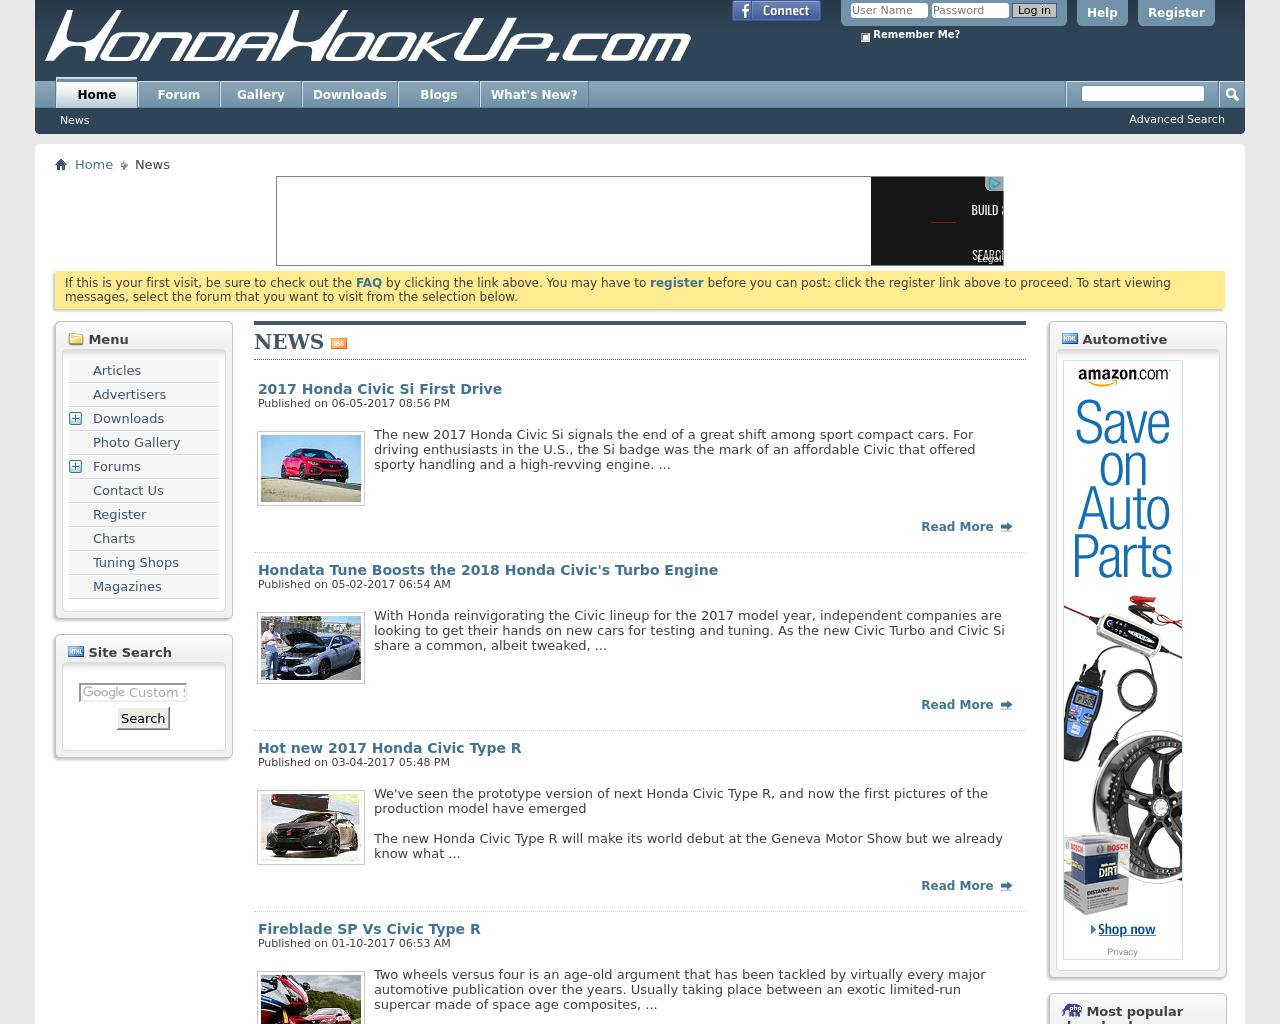 Hondahookup.com-Advertising-Reviews-Pricing